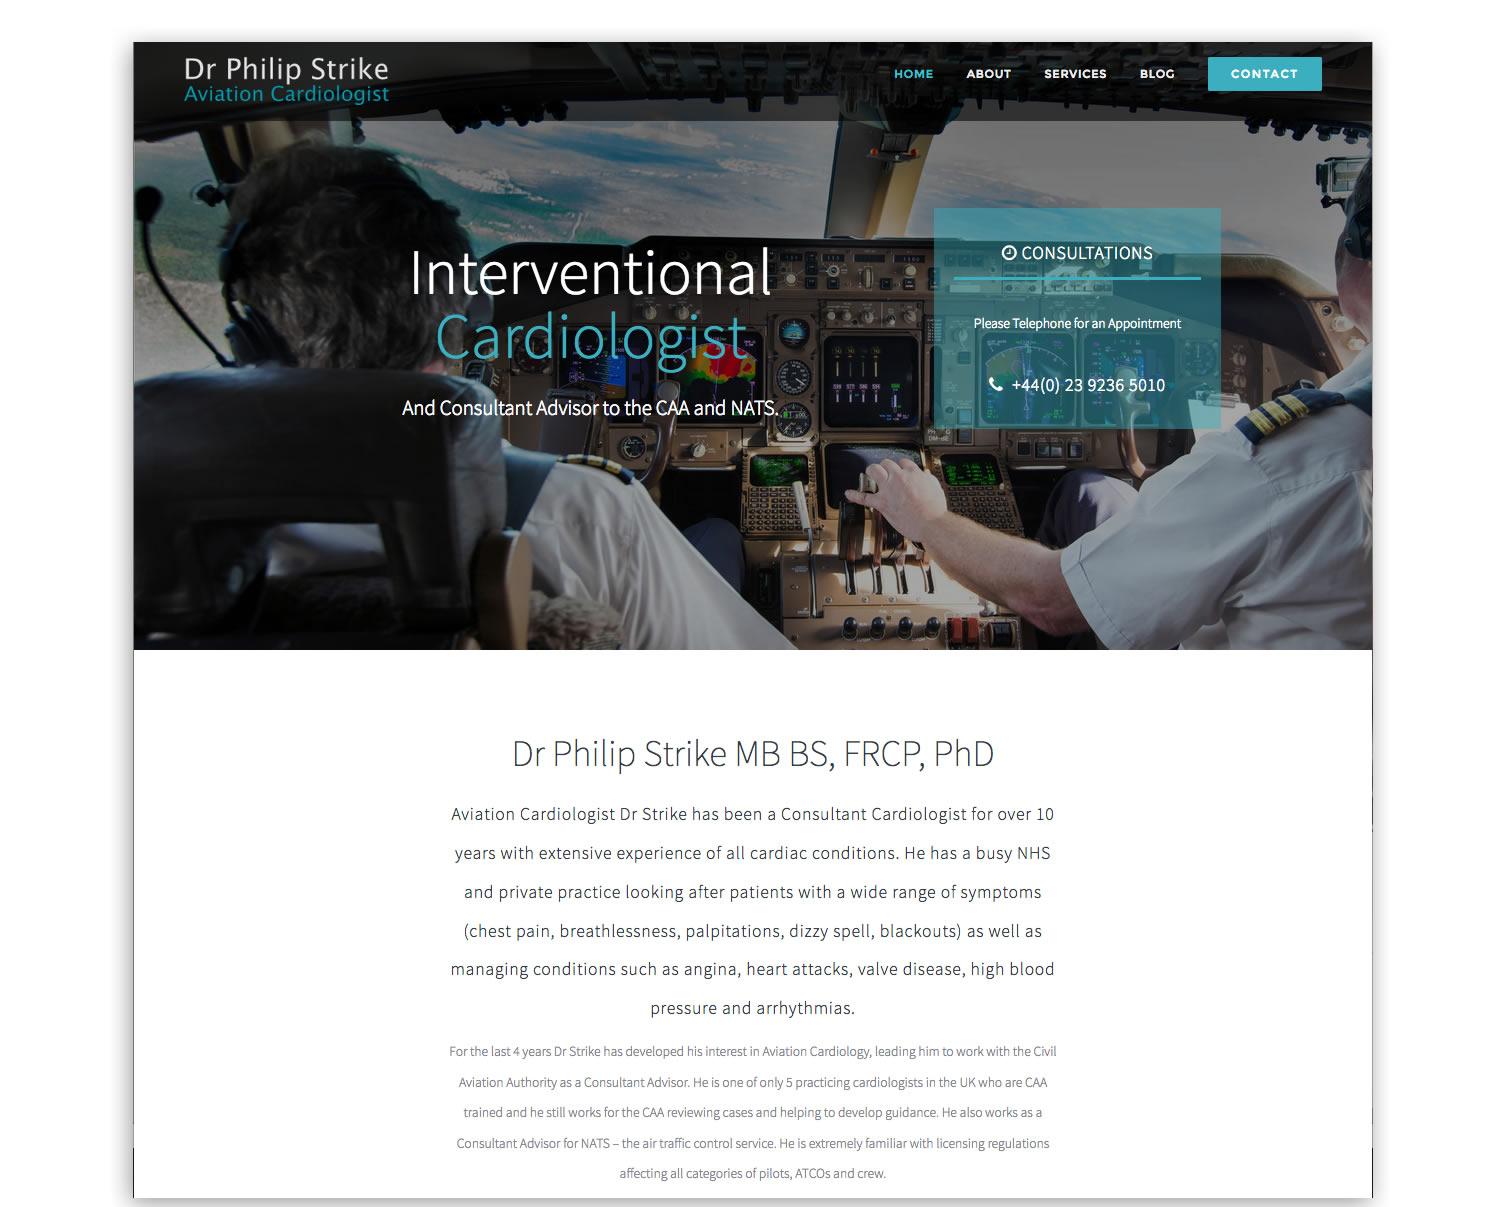 Interventional Cardiologist web development